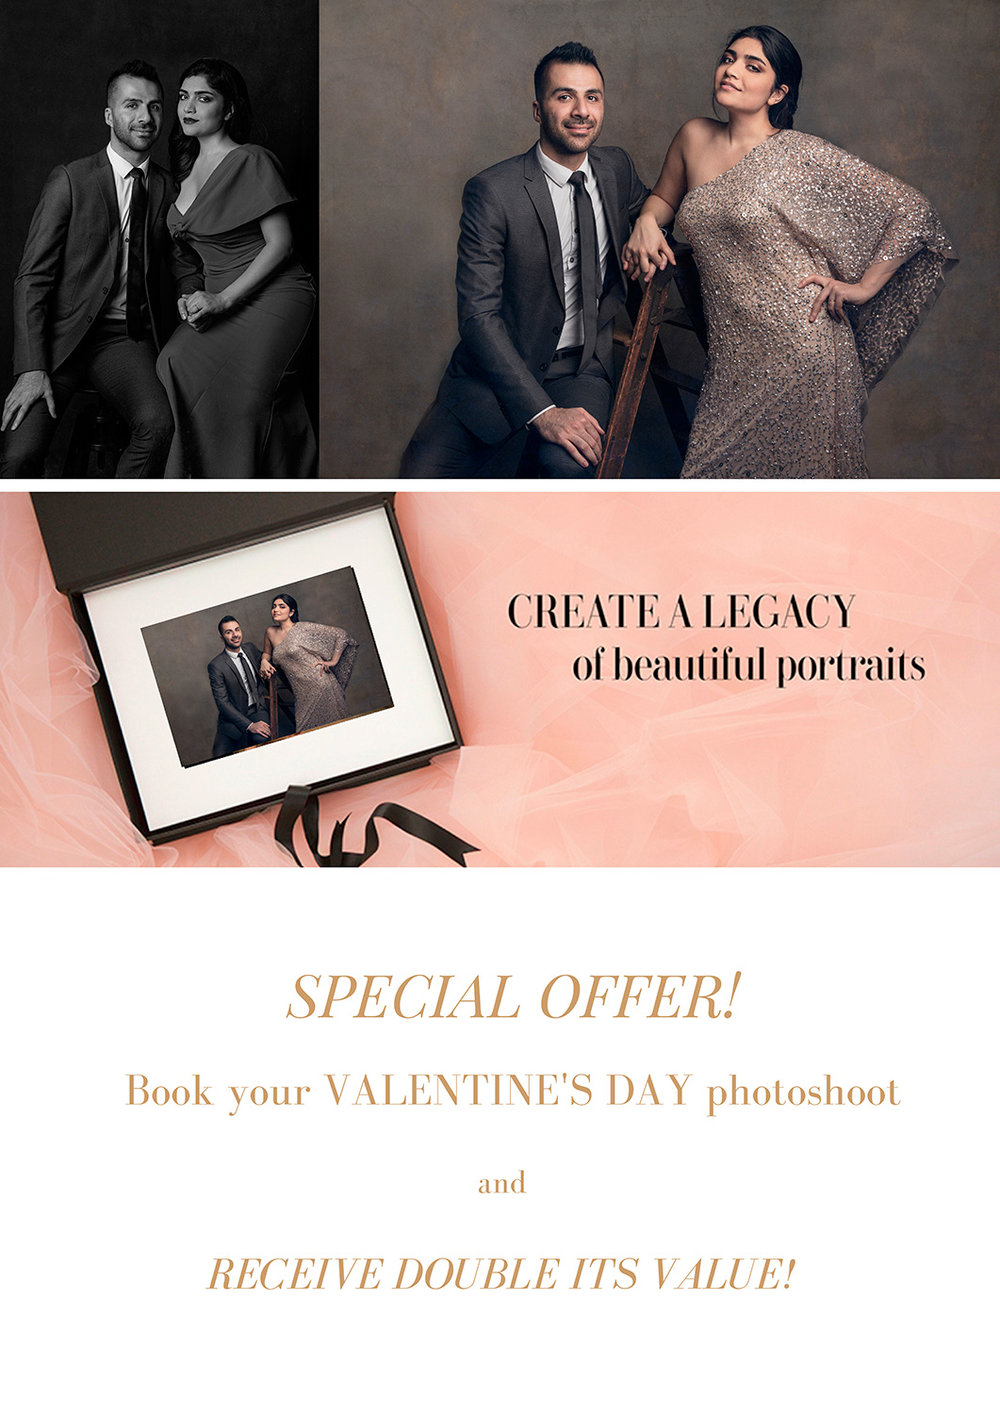 valentines-day-promo-1-WEB.jpg